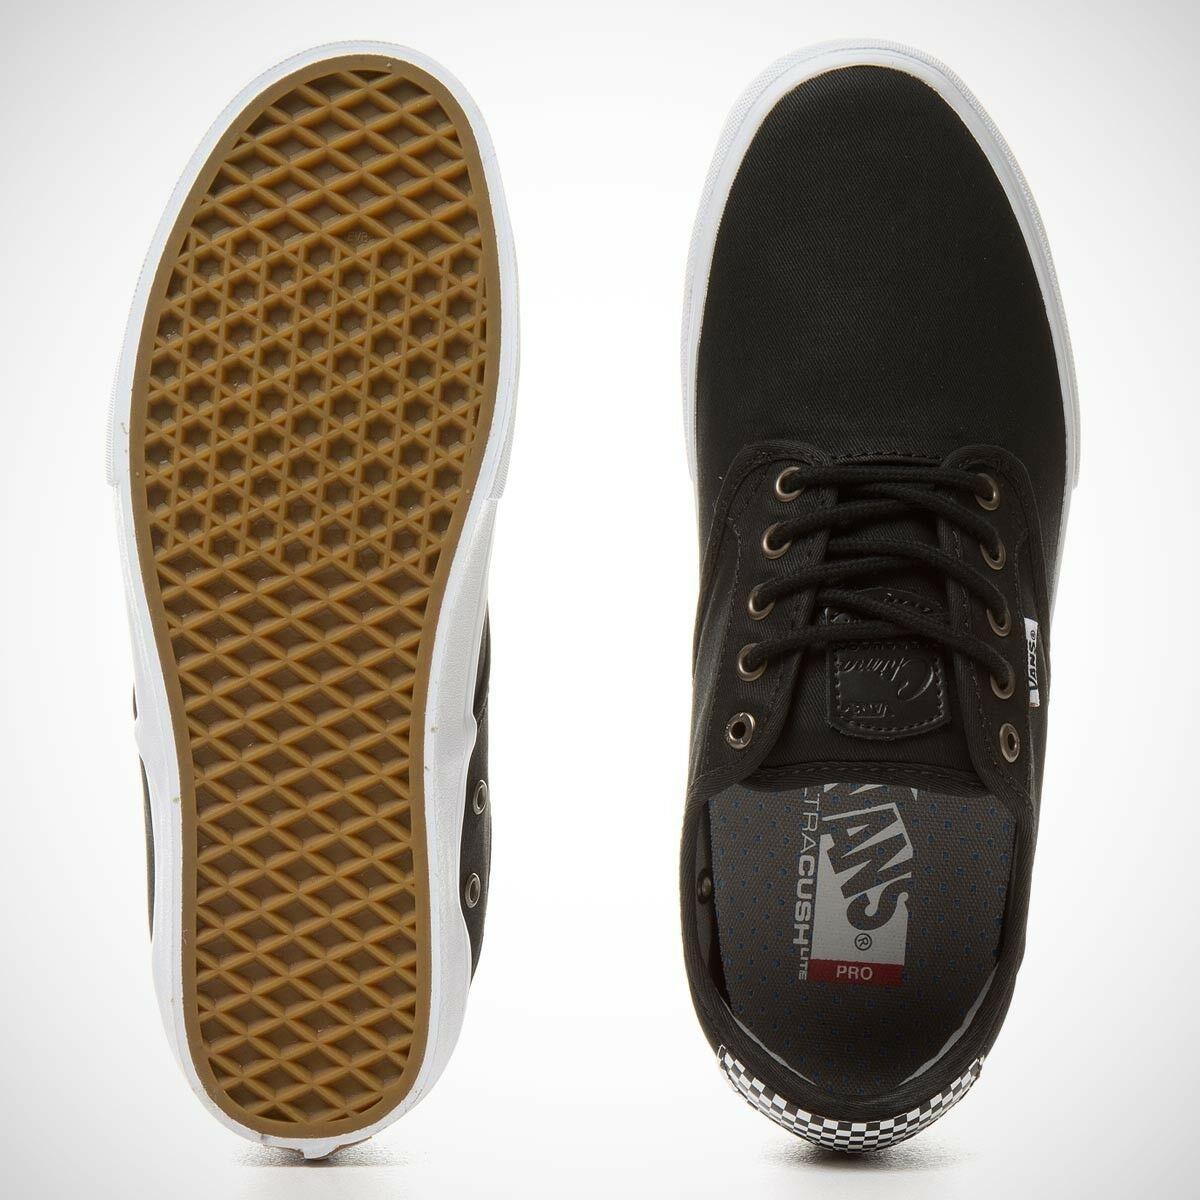 Vans Chima Ferguson Pro WAXED TWILL BLACK CHECKERS Men's Skate Shoes SZ 12 NEW